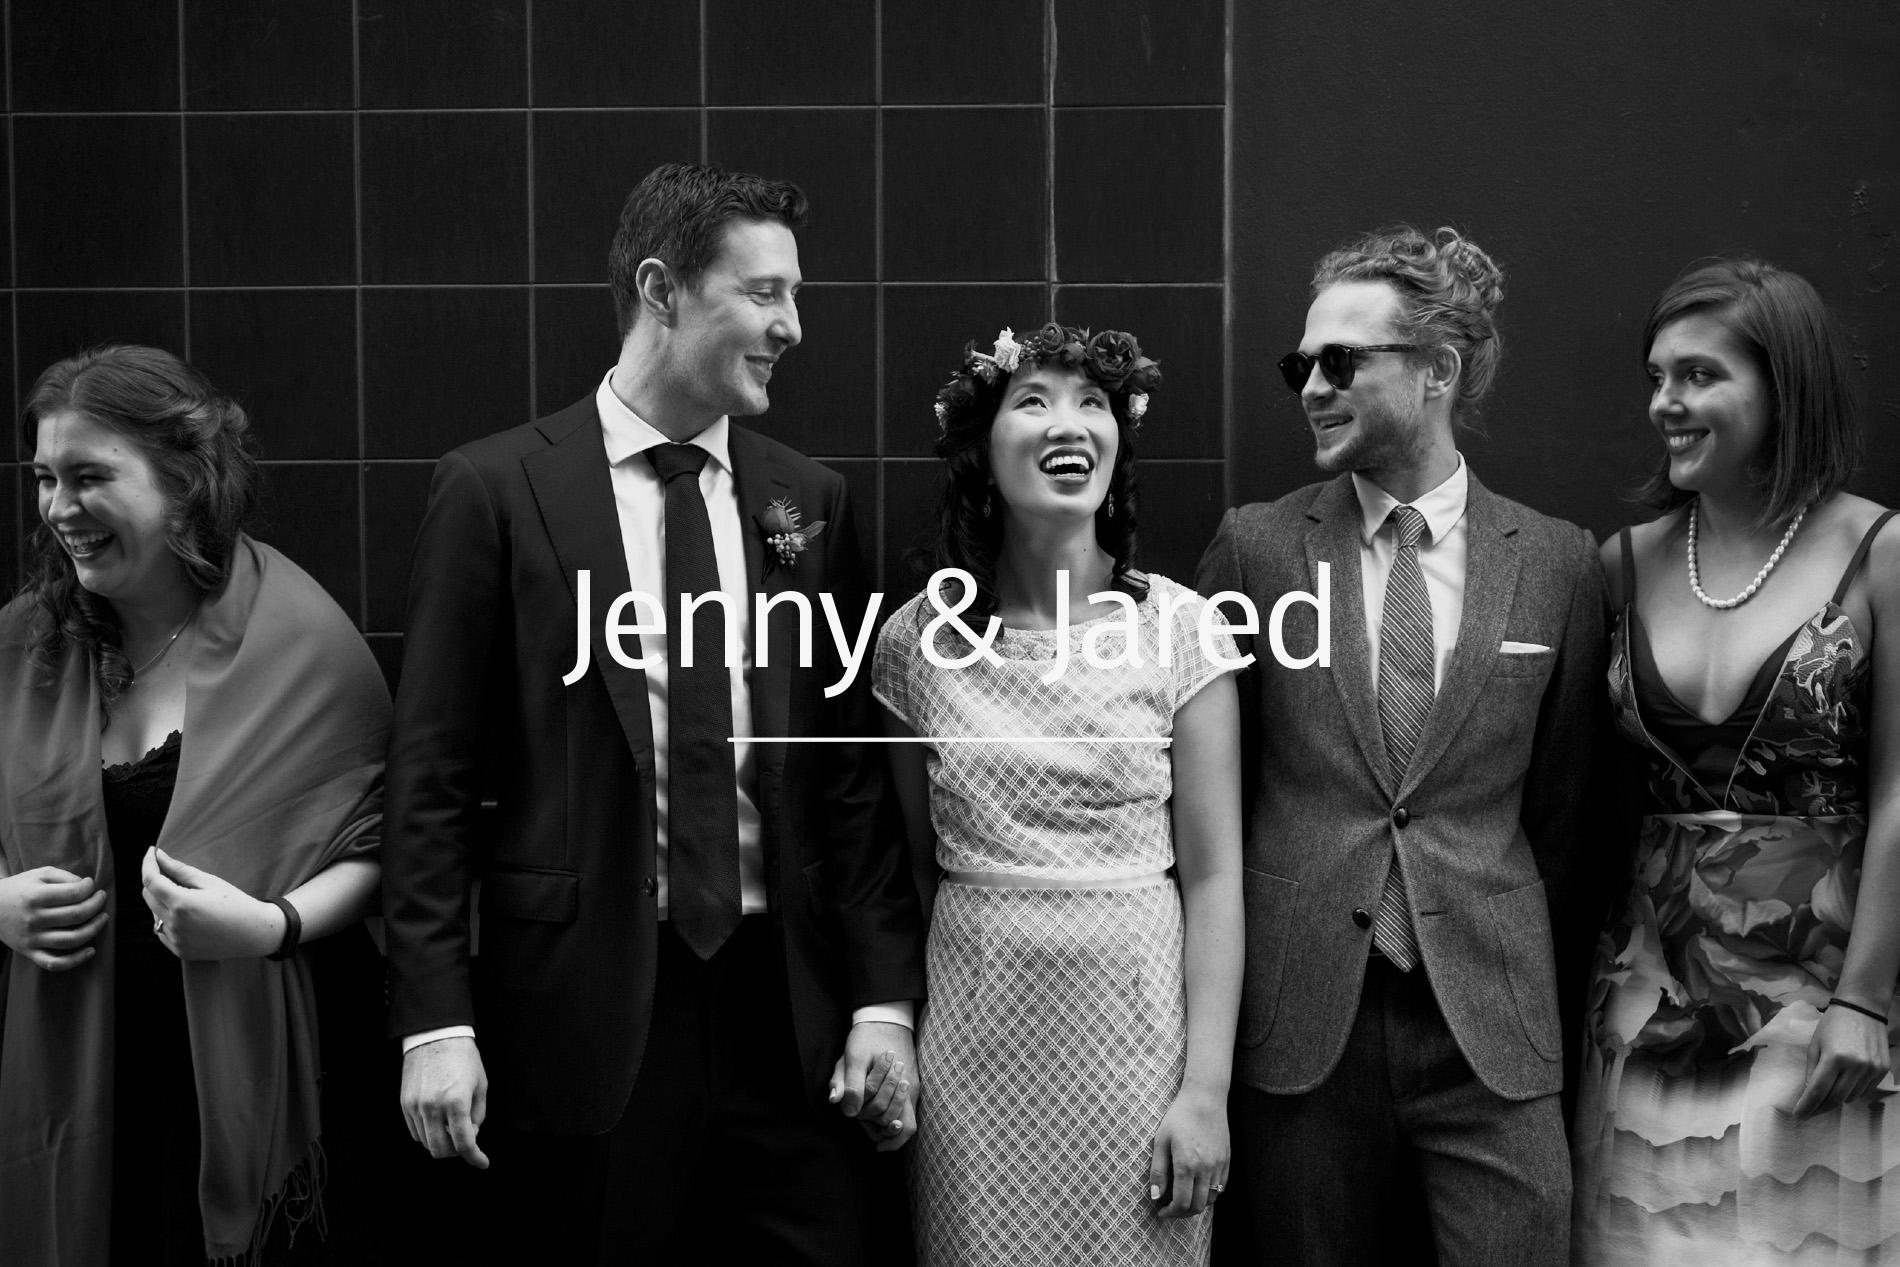 Jenny and Jared